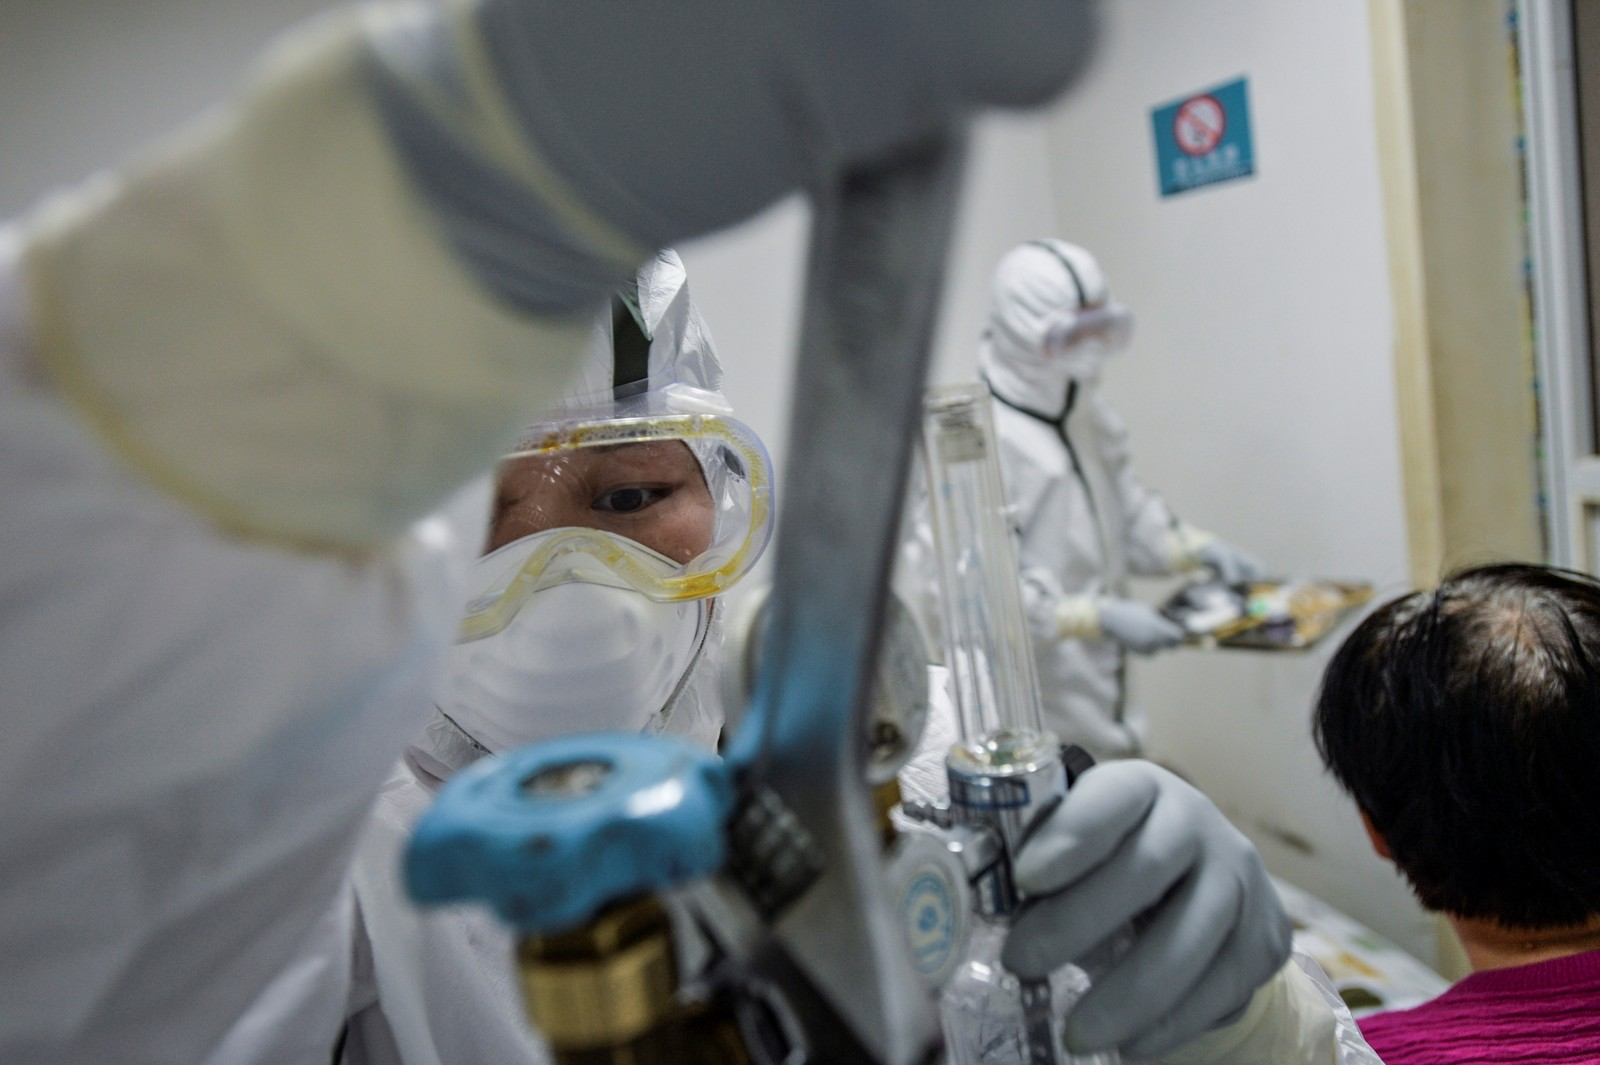 Mortes por coronavírus passam de 1,6 mil na China